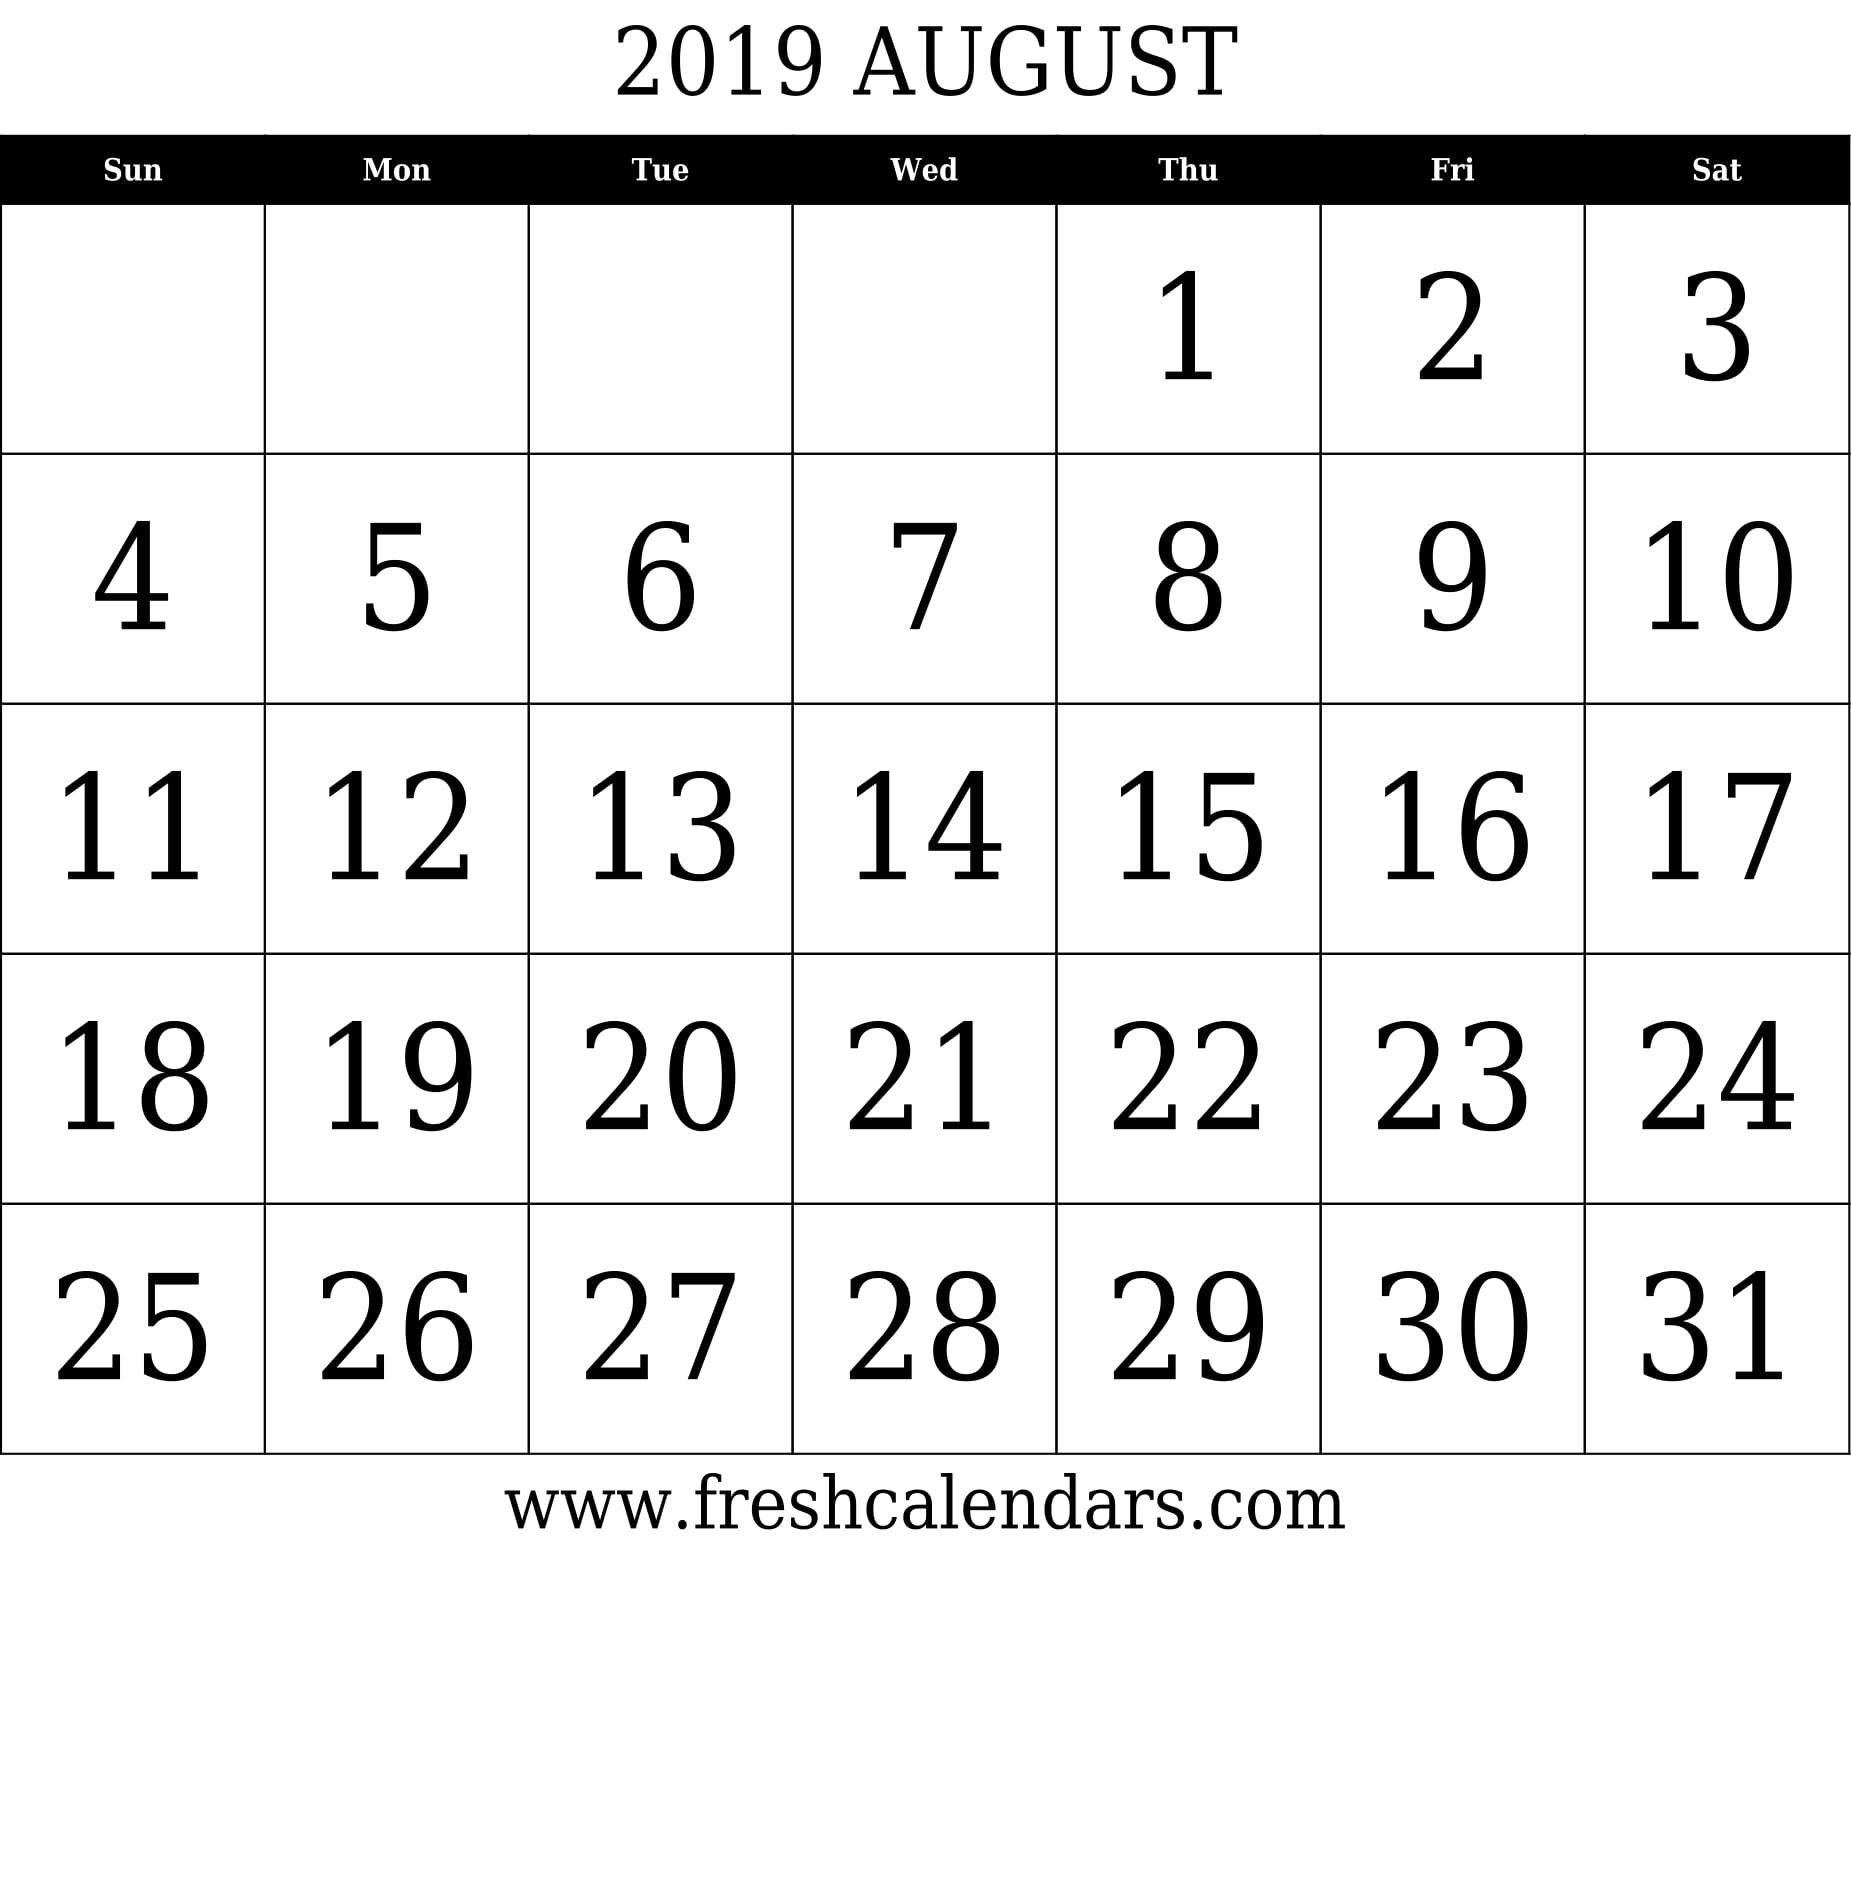 August 2019 Calendar Printable - Fresh Calendars August 7 2019 Calendar